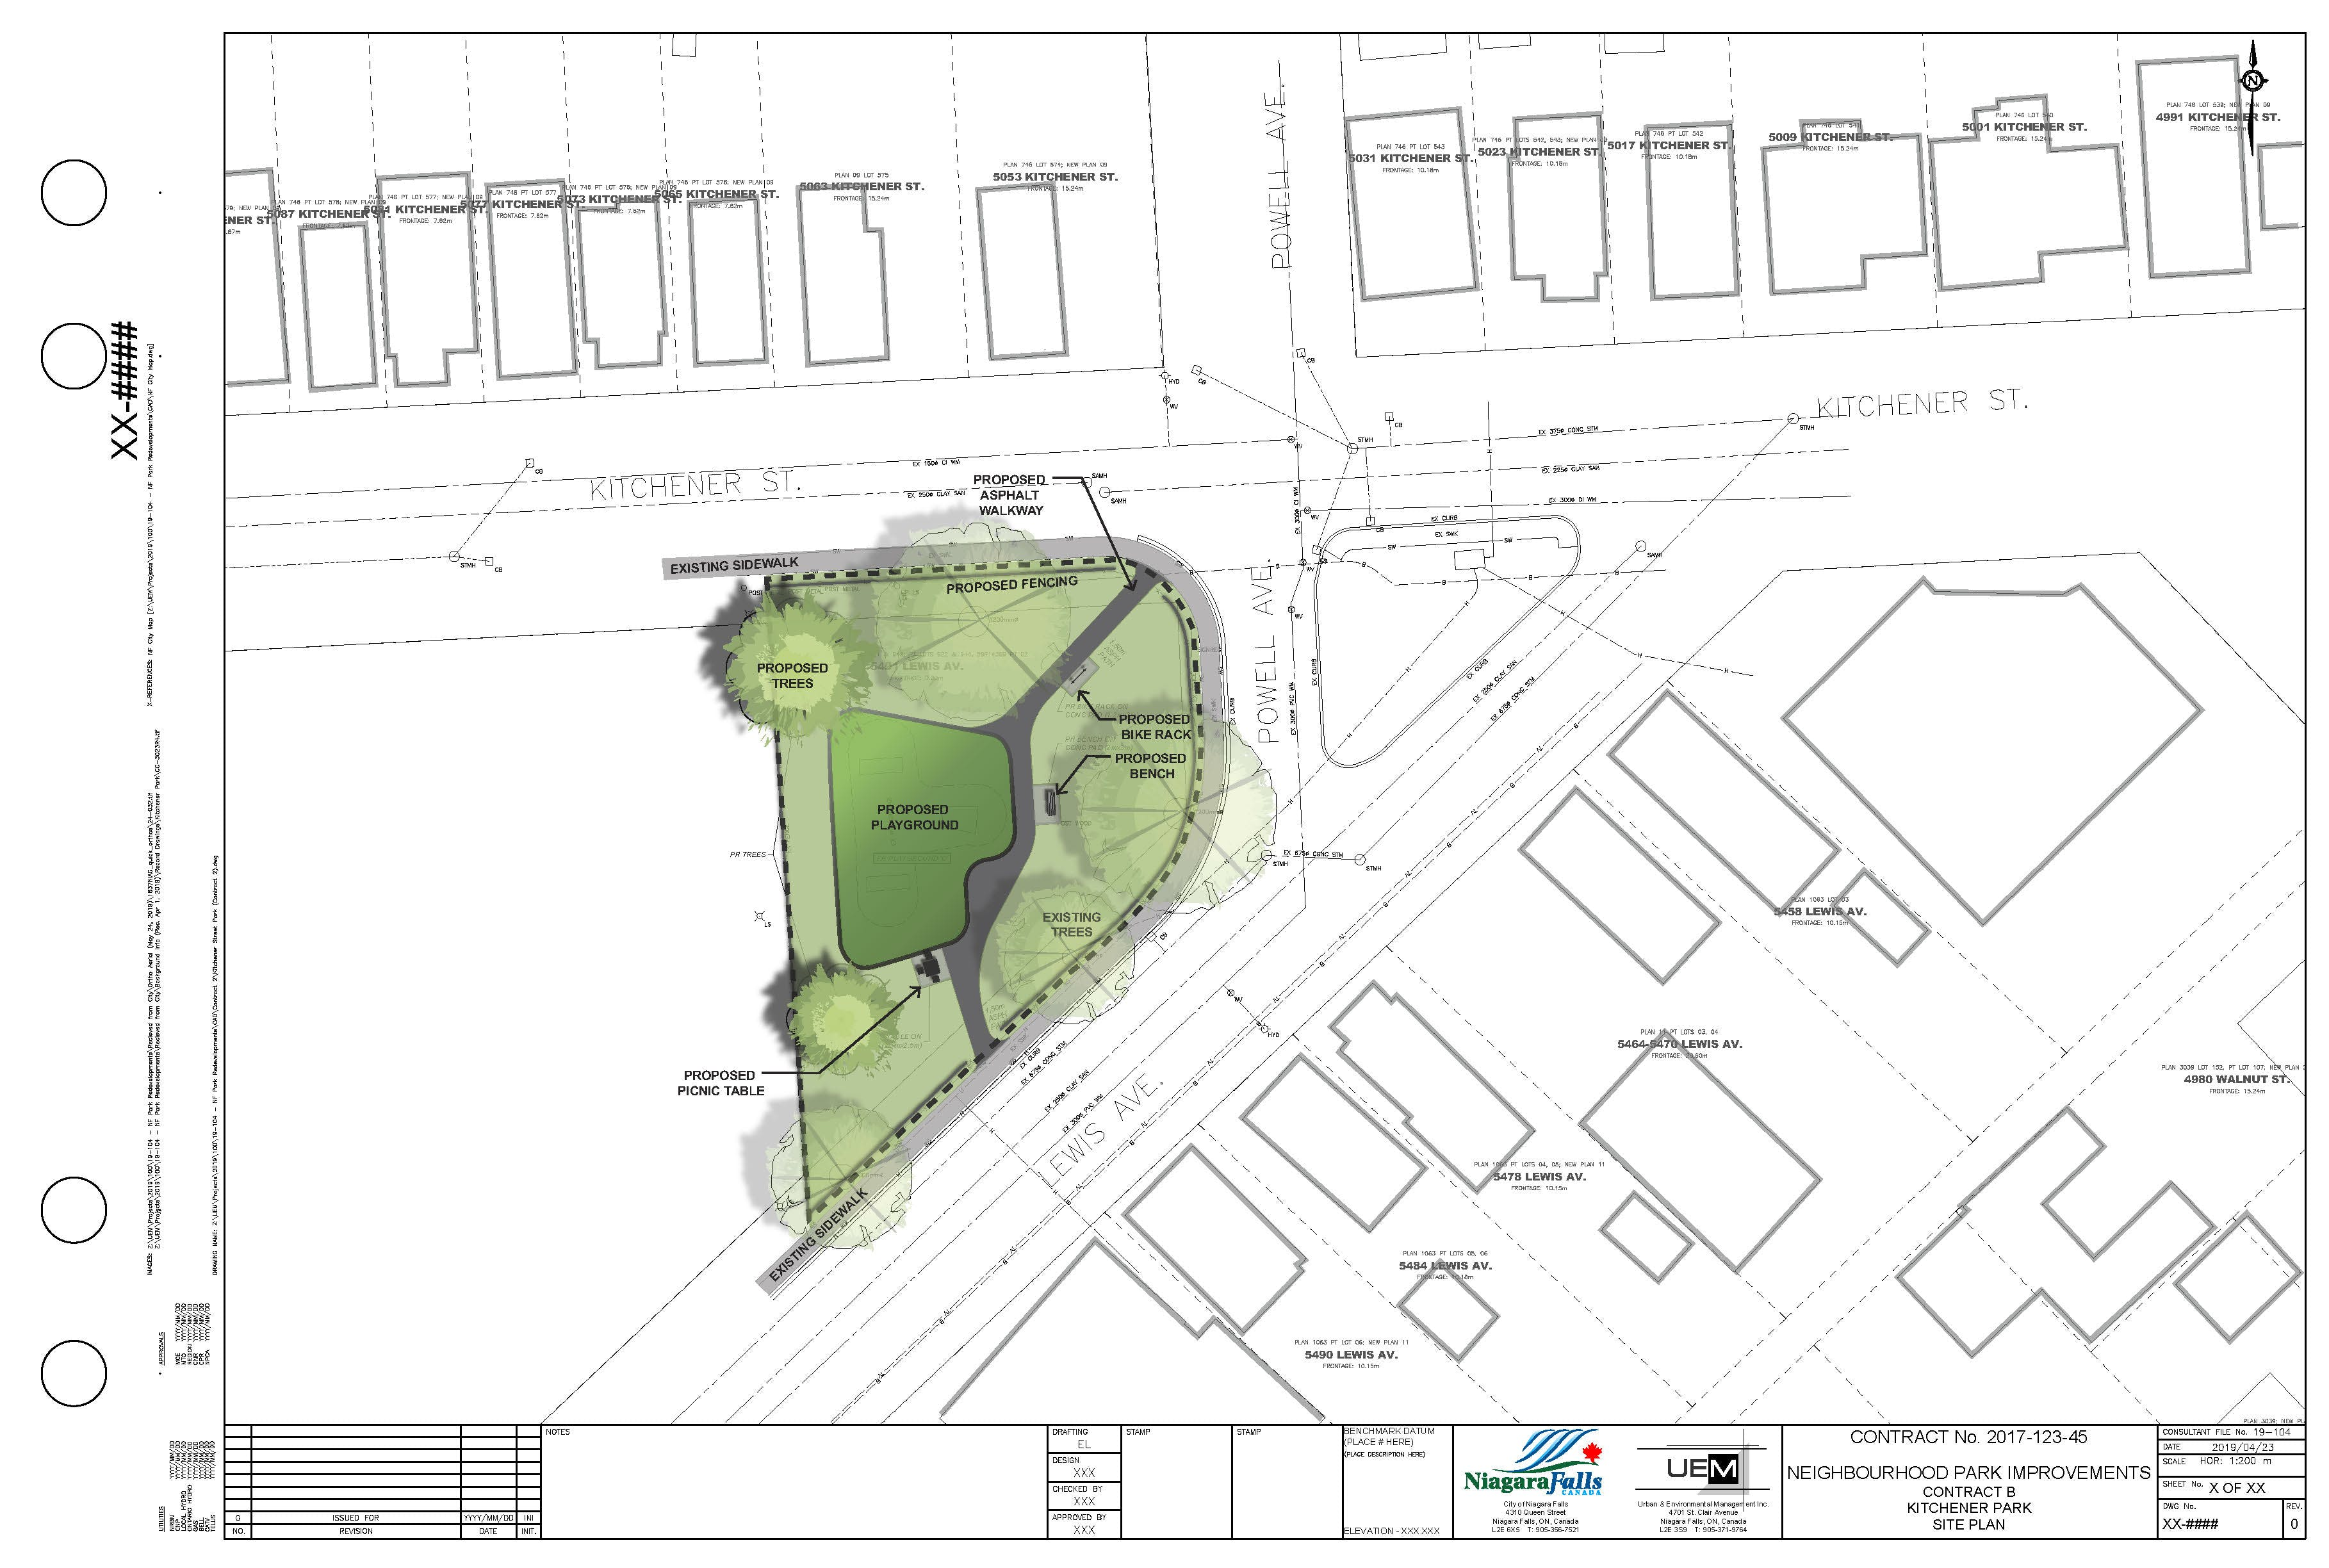 Kitchener Park Rendering